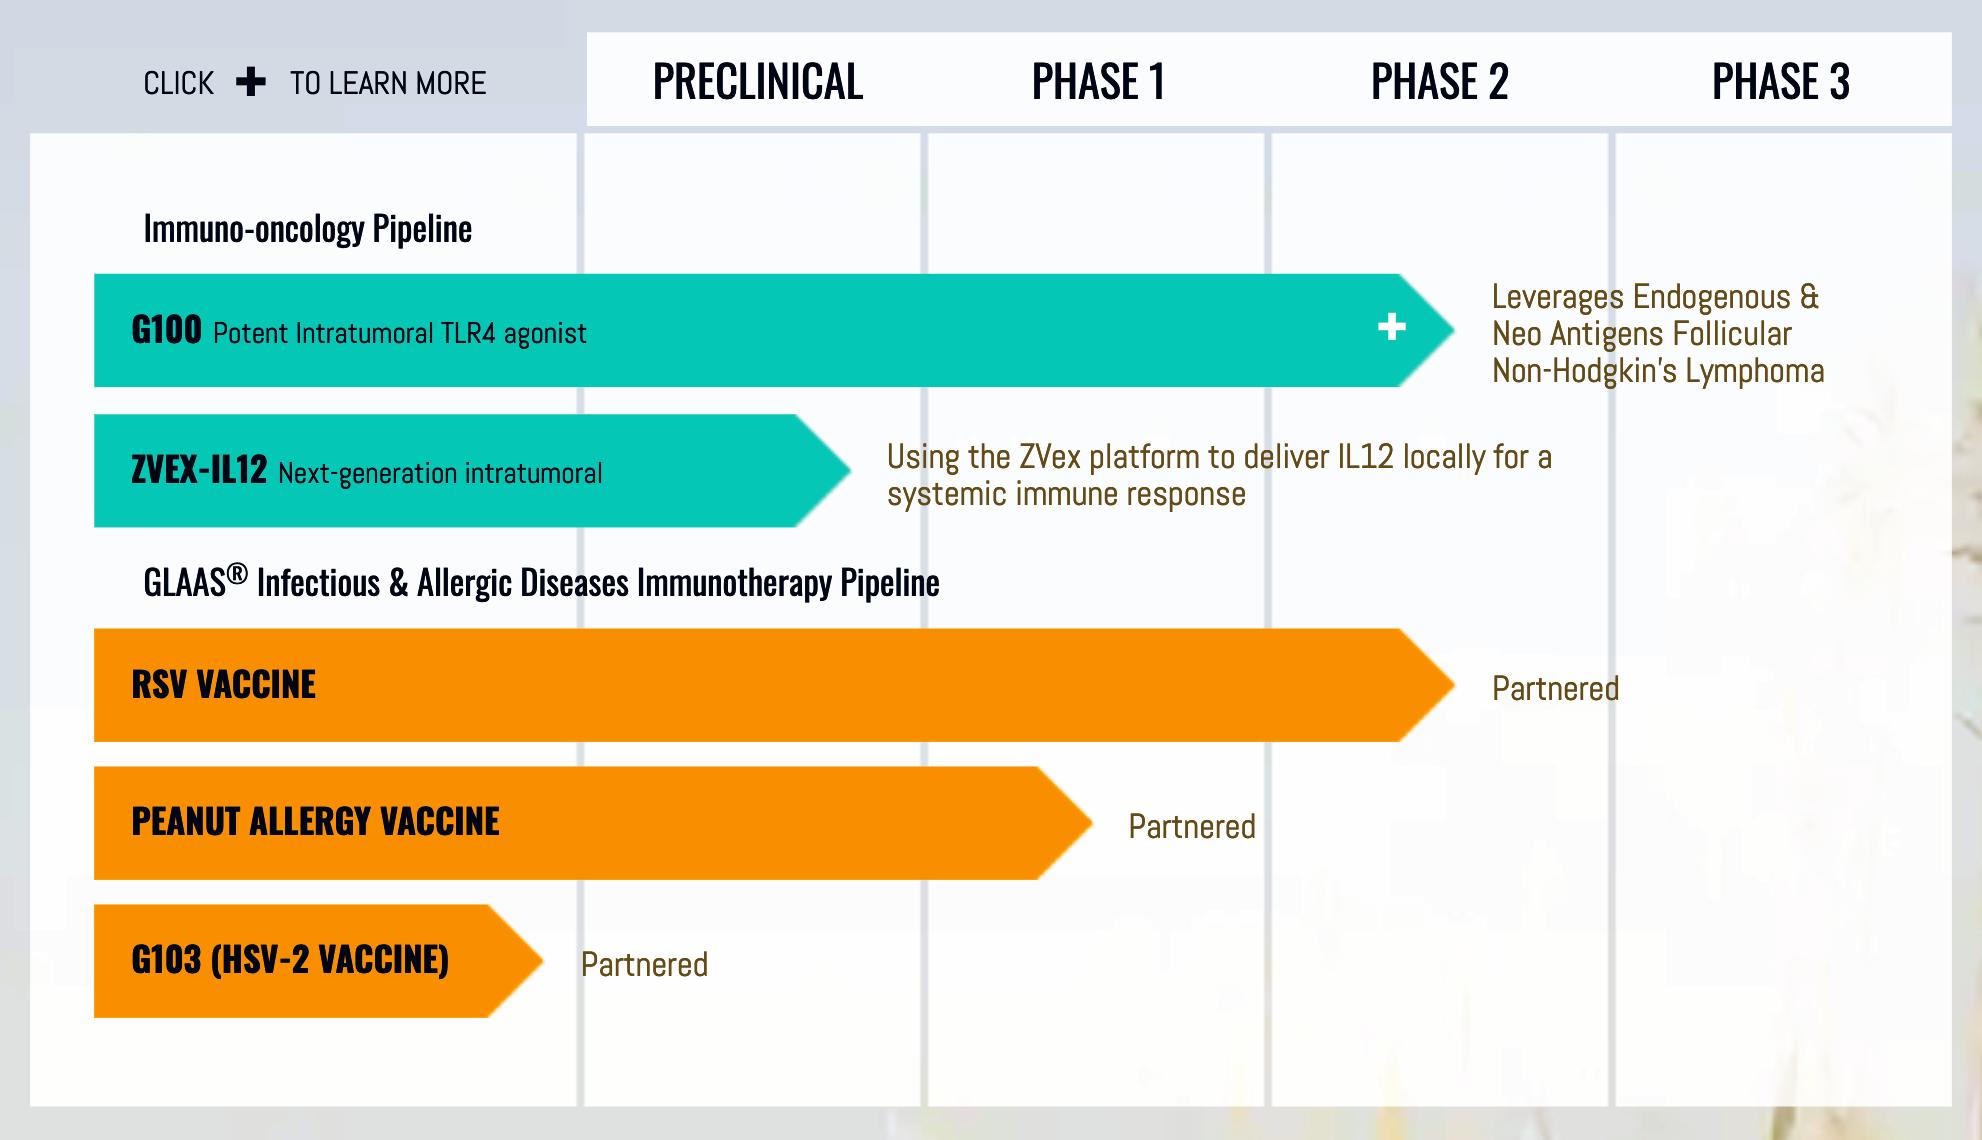 immune design pipeline - Merck & Co. углубилась в концепцию противораковых вакцин